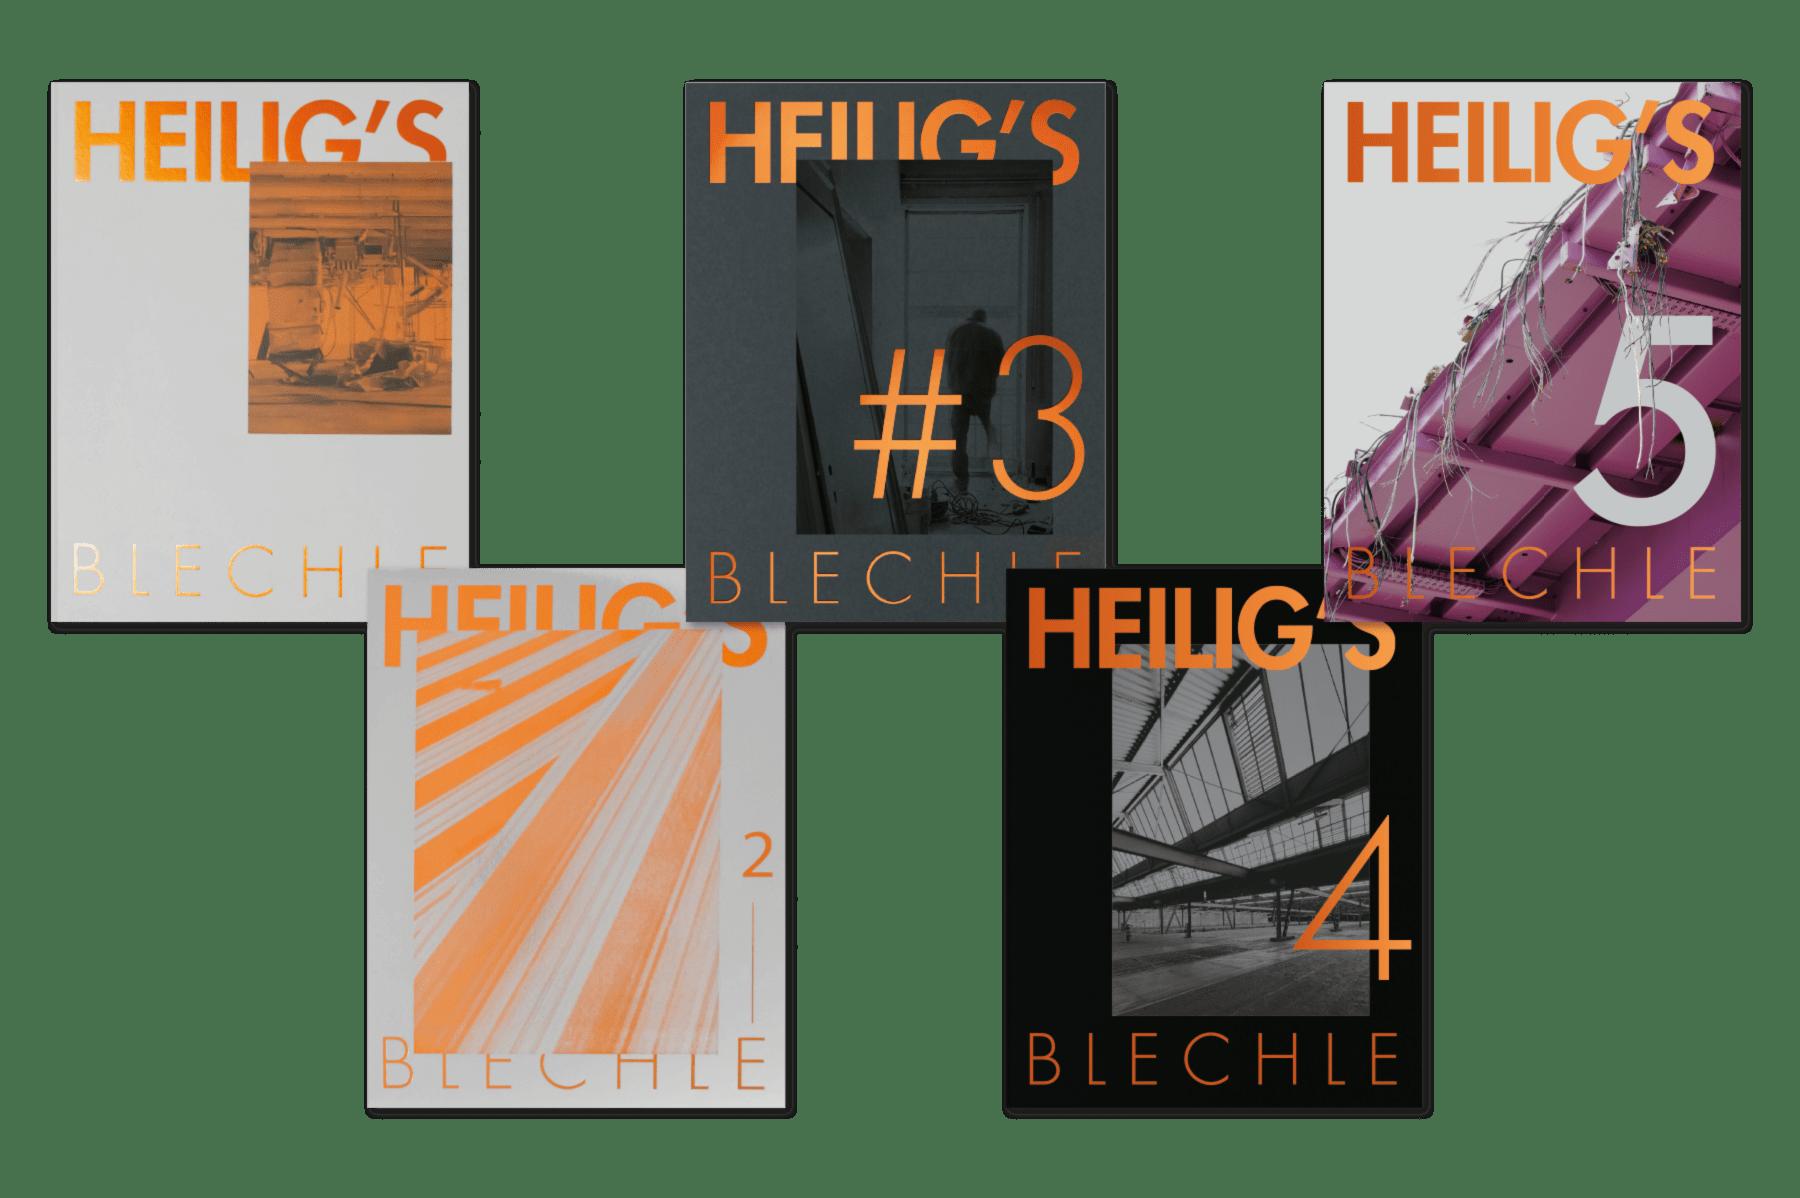 Heilig's Blechle Booklets